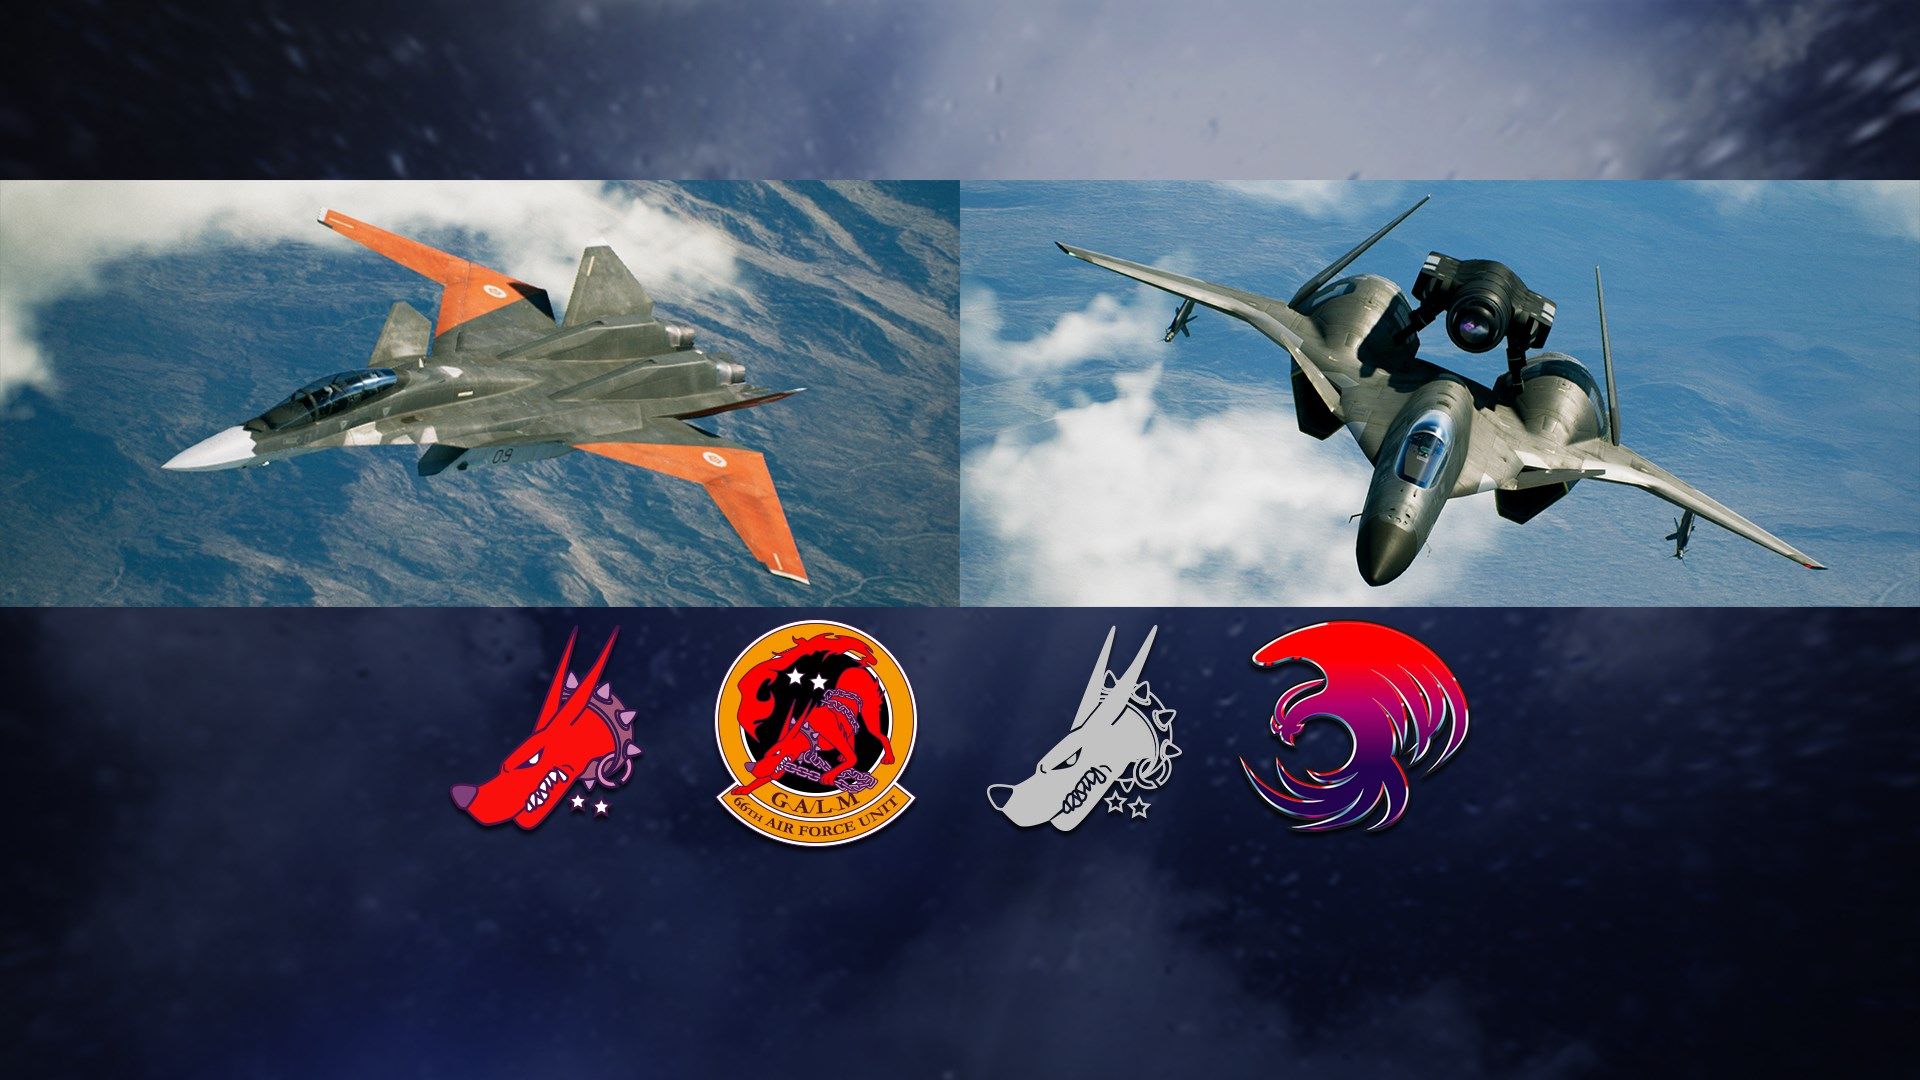 ACE COMBAT 7: SKIES UNKNOWN - ADFX-01 Morgan Set now